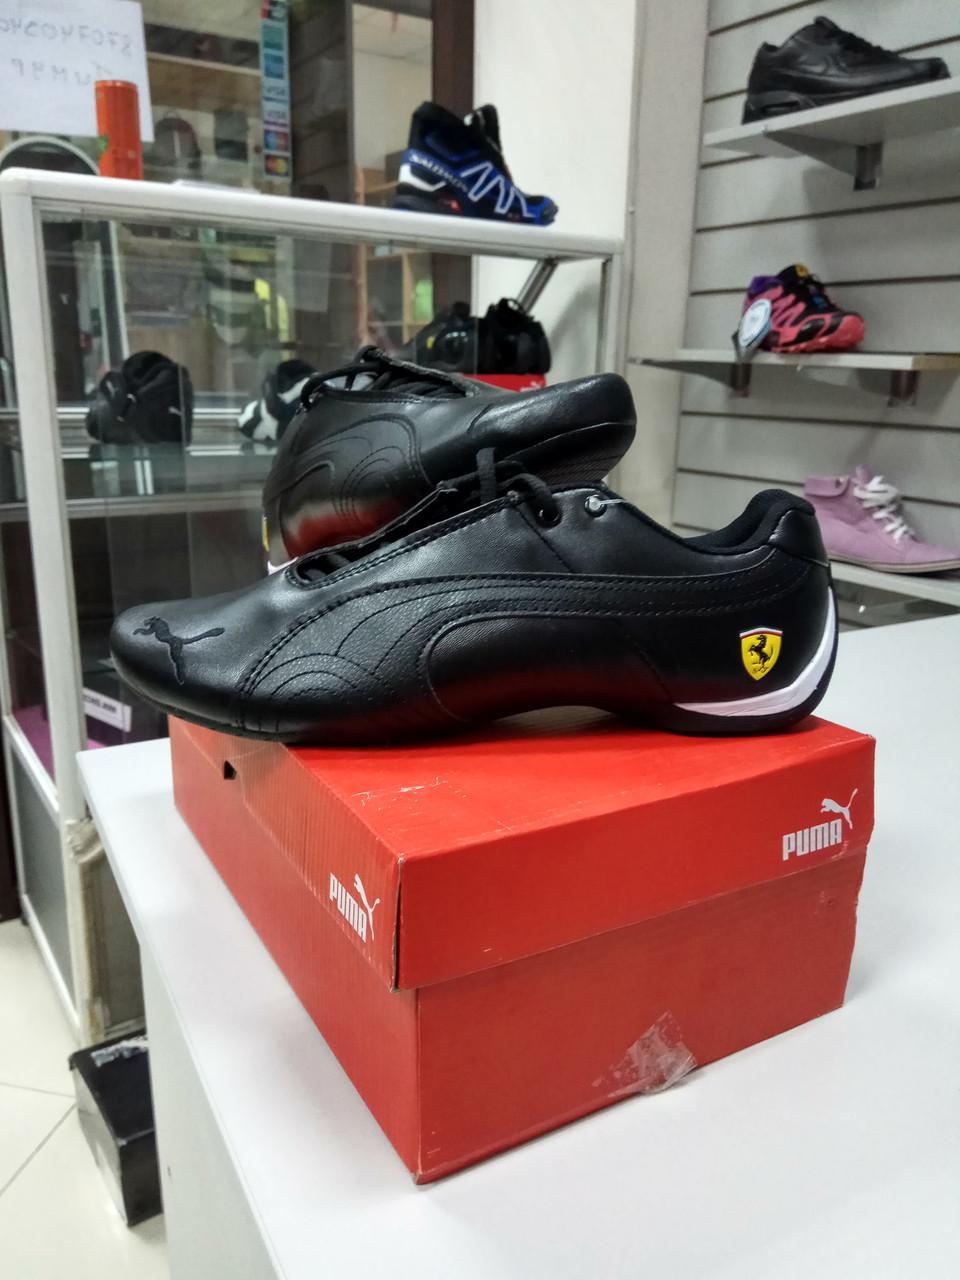 Кроссовки Puma Ferrari Design Black - фото 2